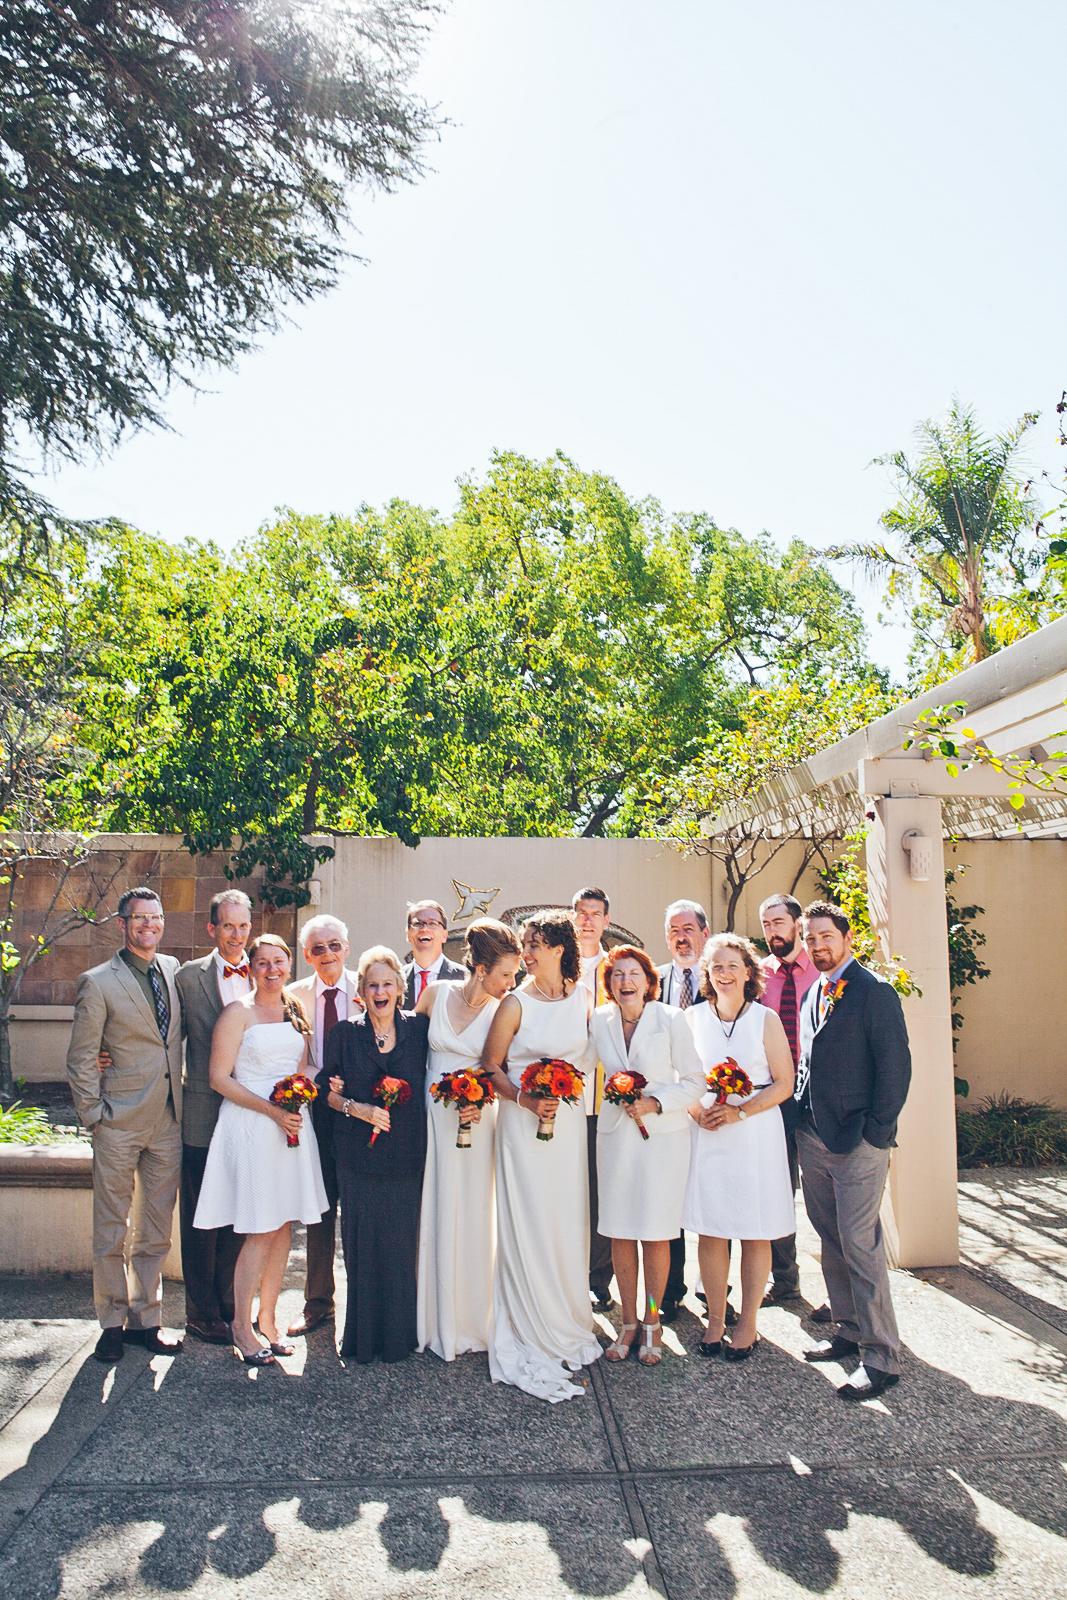 Riverside_ca_wedding_photography_marguerite_carolyn_ebony_siovhan_bokeh_photography_40.jpg